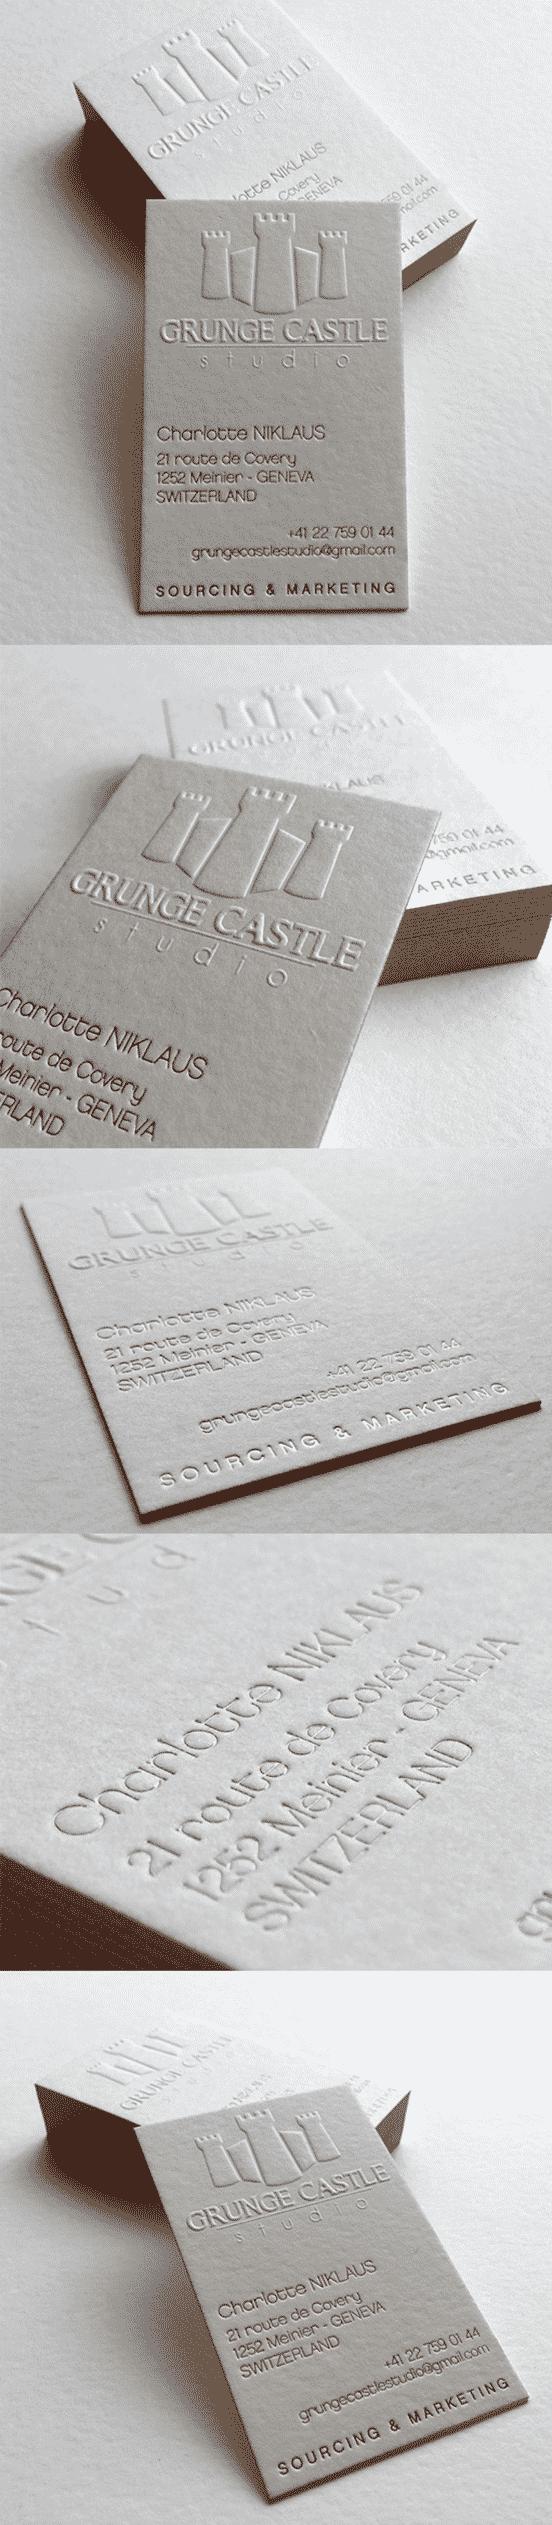 Sculptural Embossing Business Card